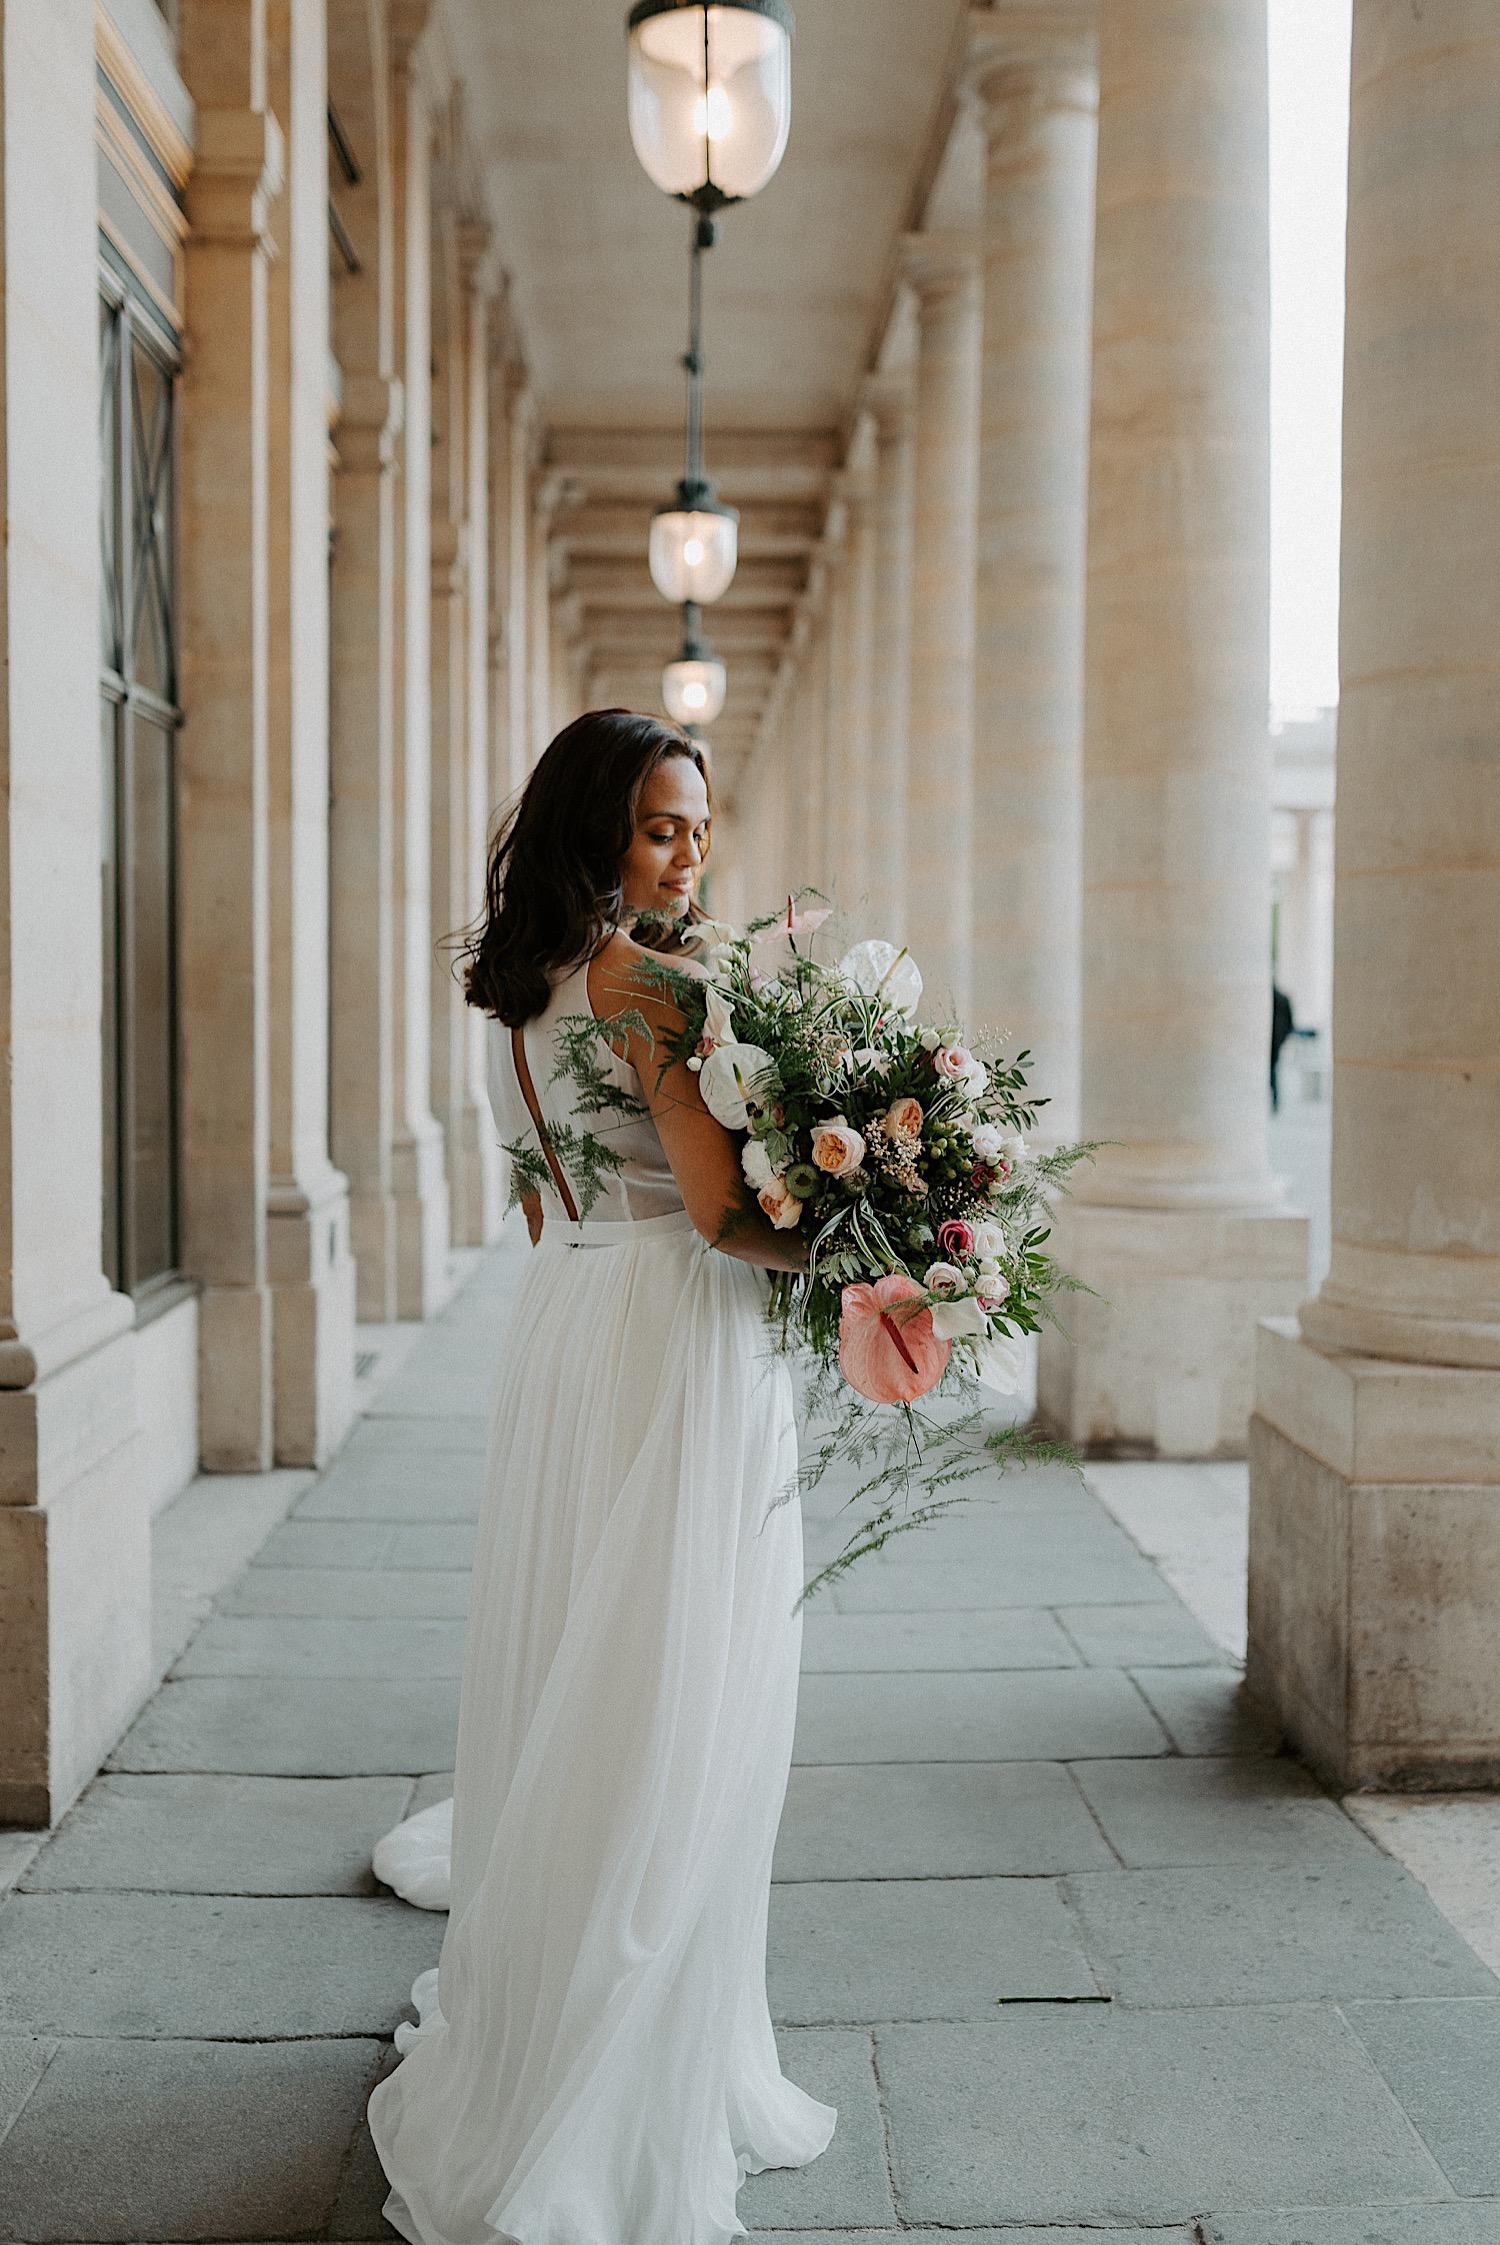 Paris Louvre Wedding Photos Paris Wedding Photographer Destination Wedding France Anais Possamai Photography 02